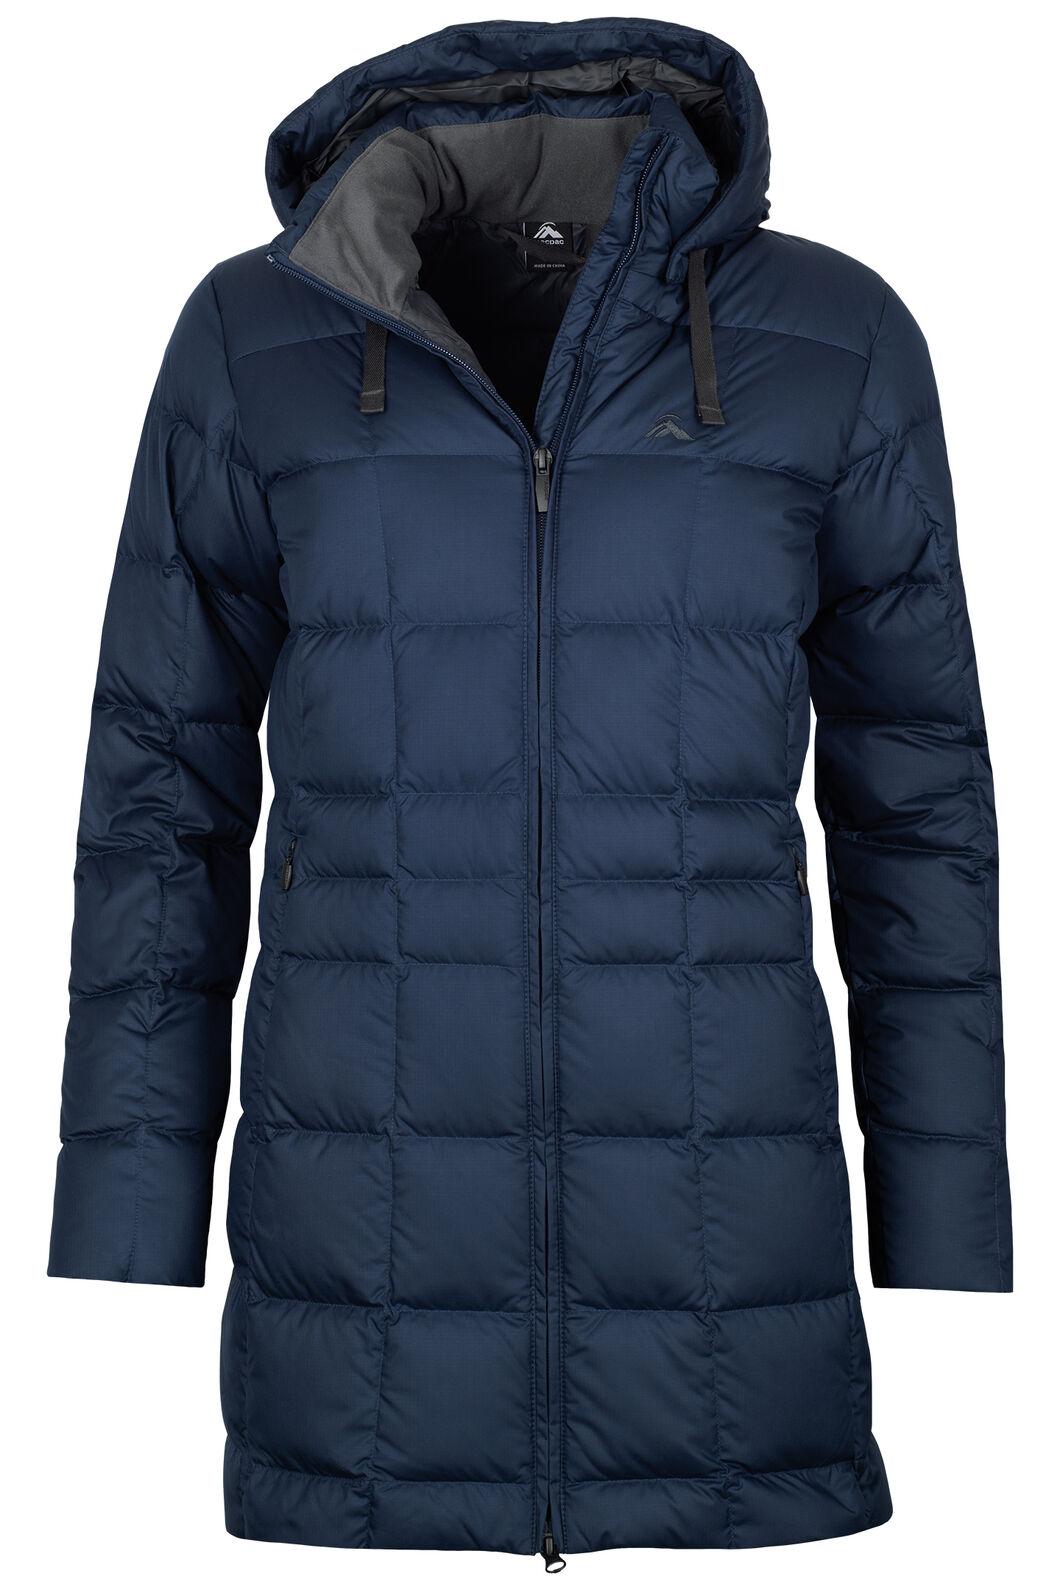 Aurora Down Coat V3 - Women's, Black Iris, hi-res